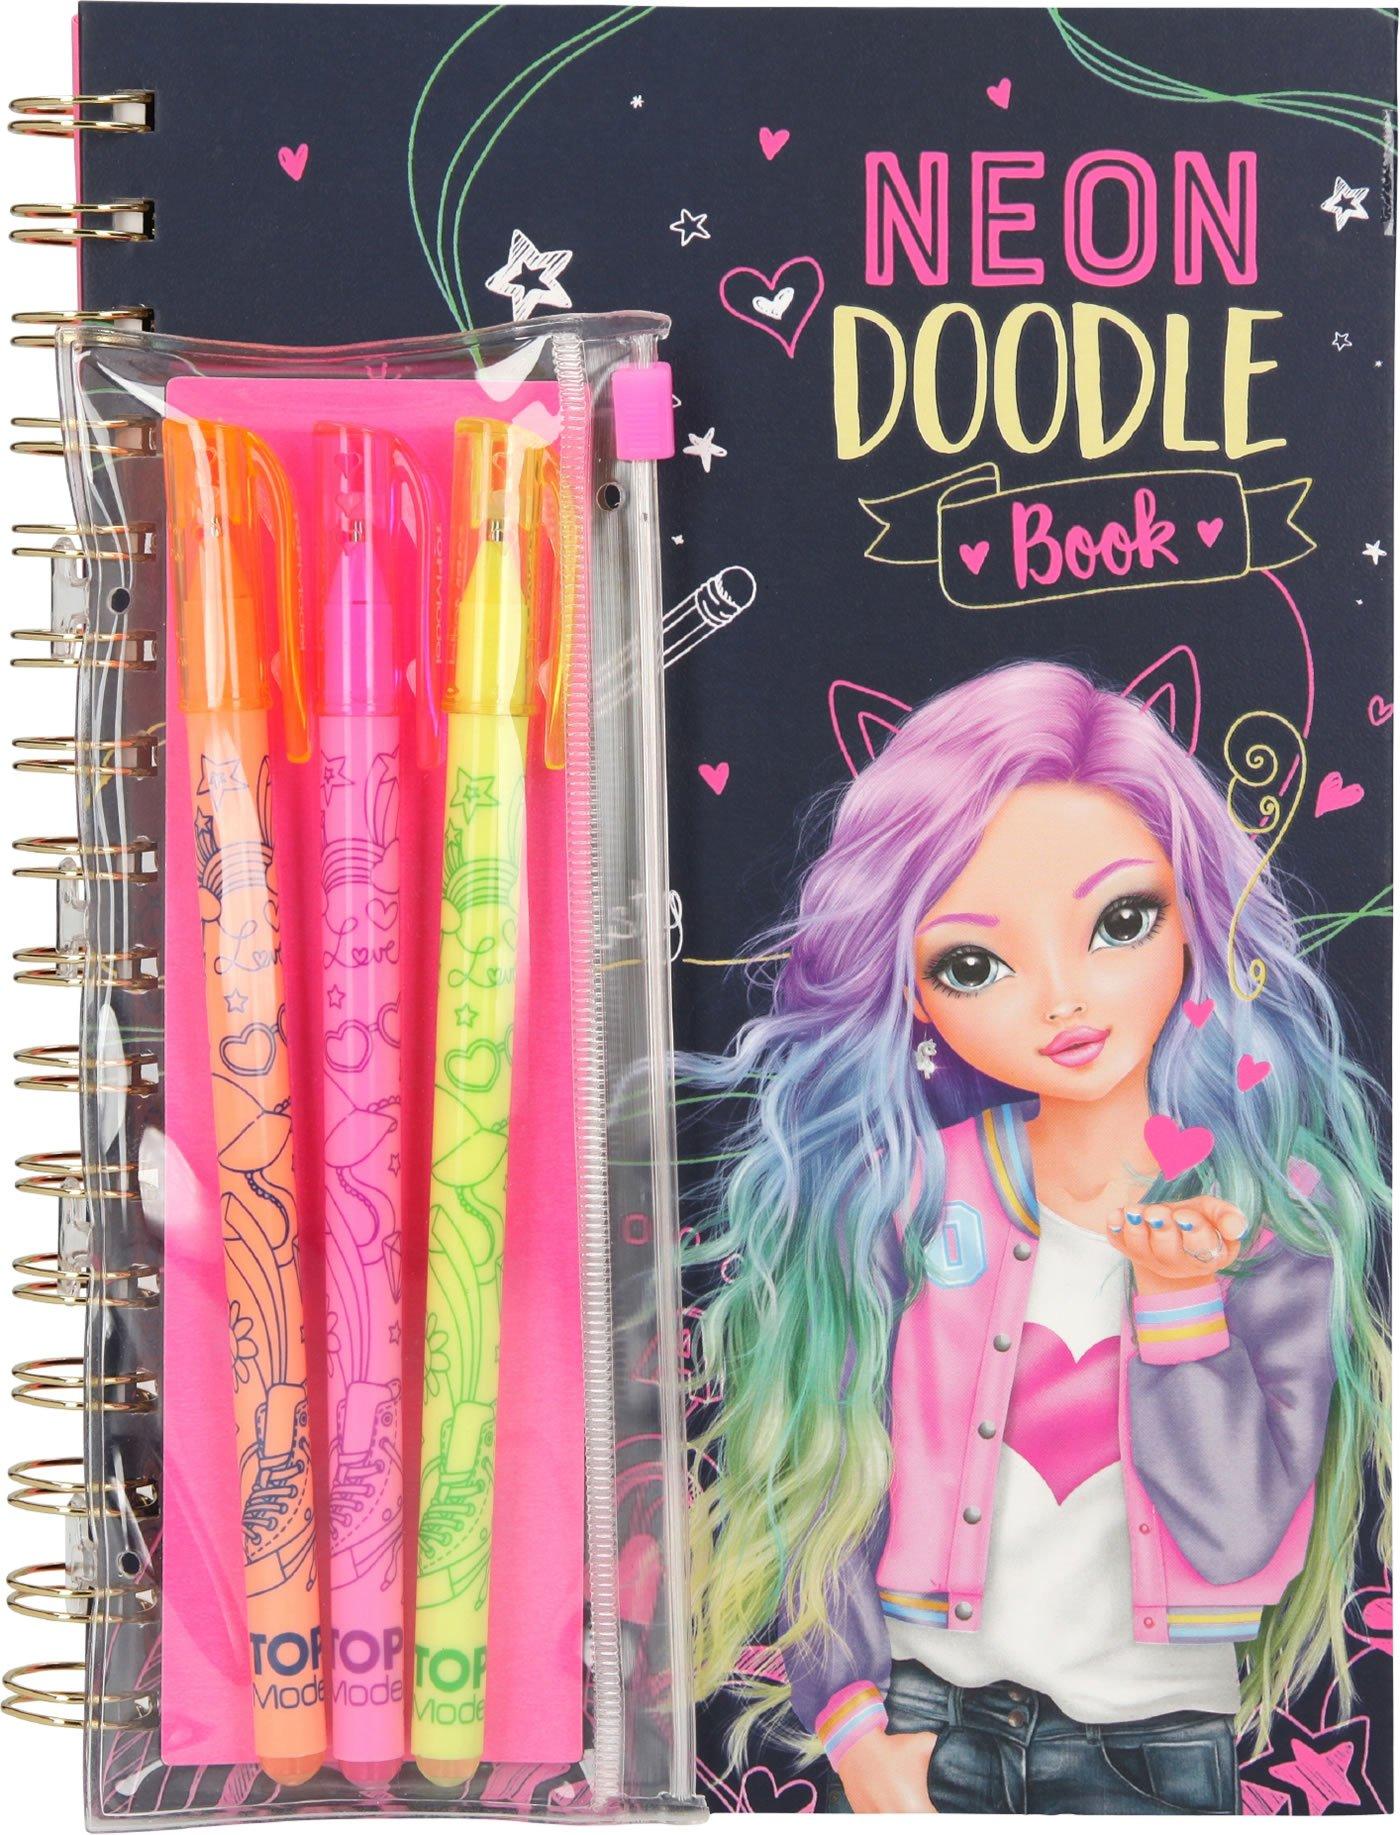 Top Model - Neon Doodle Malbuch mit Neon Stifte-Set